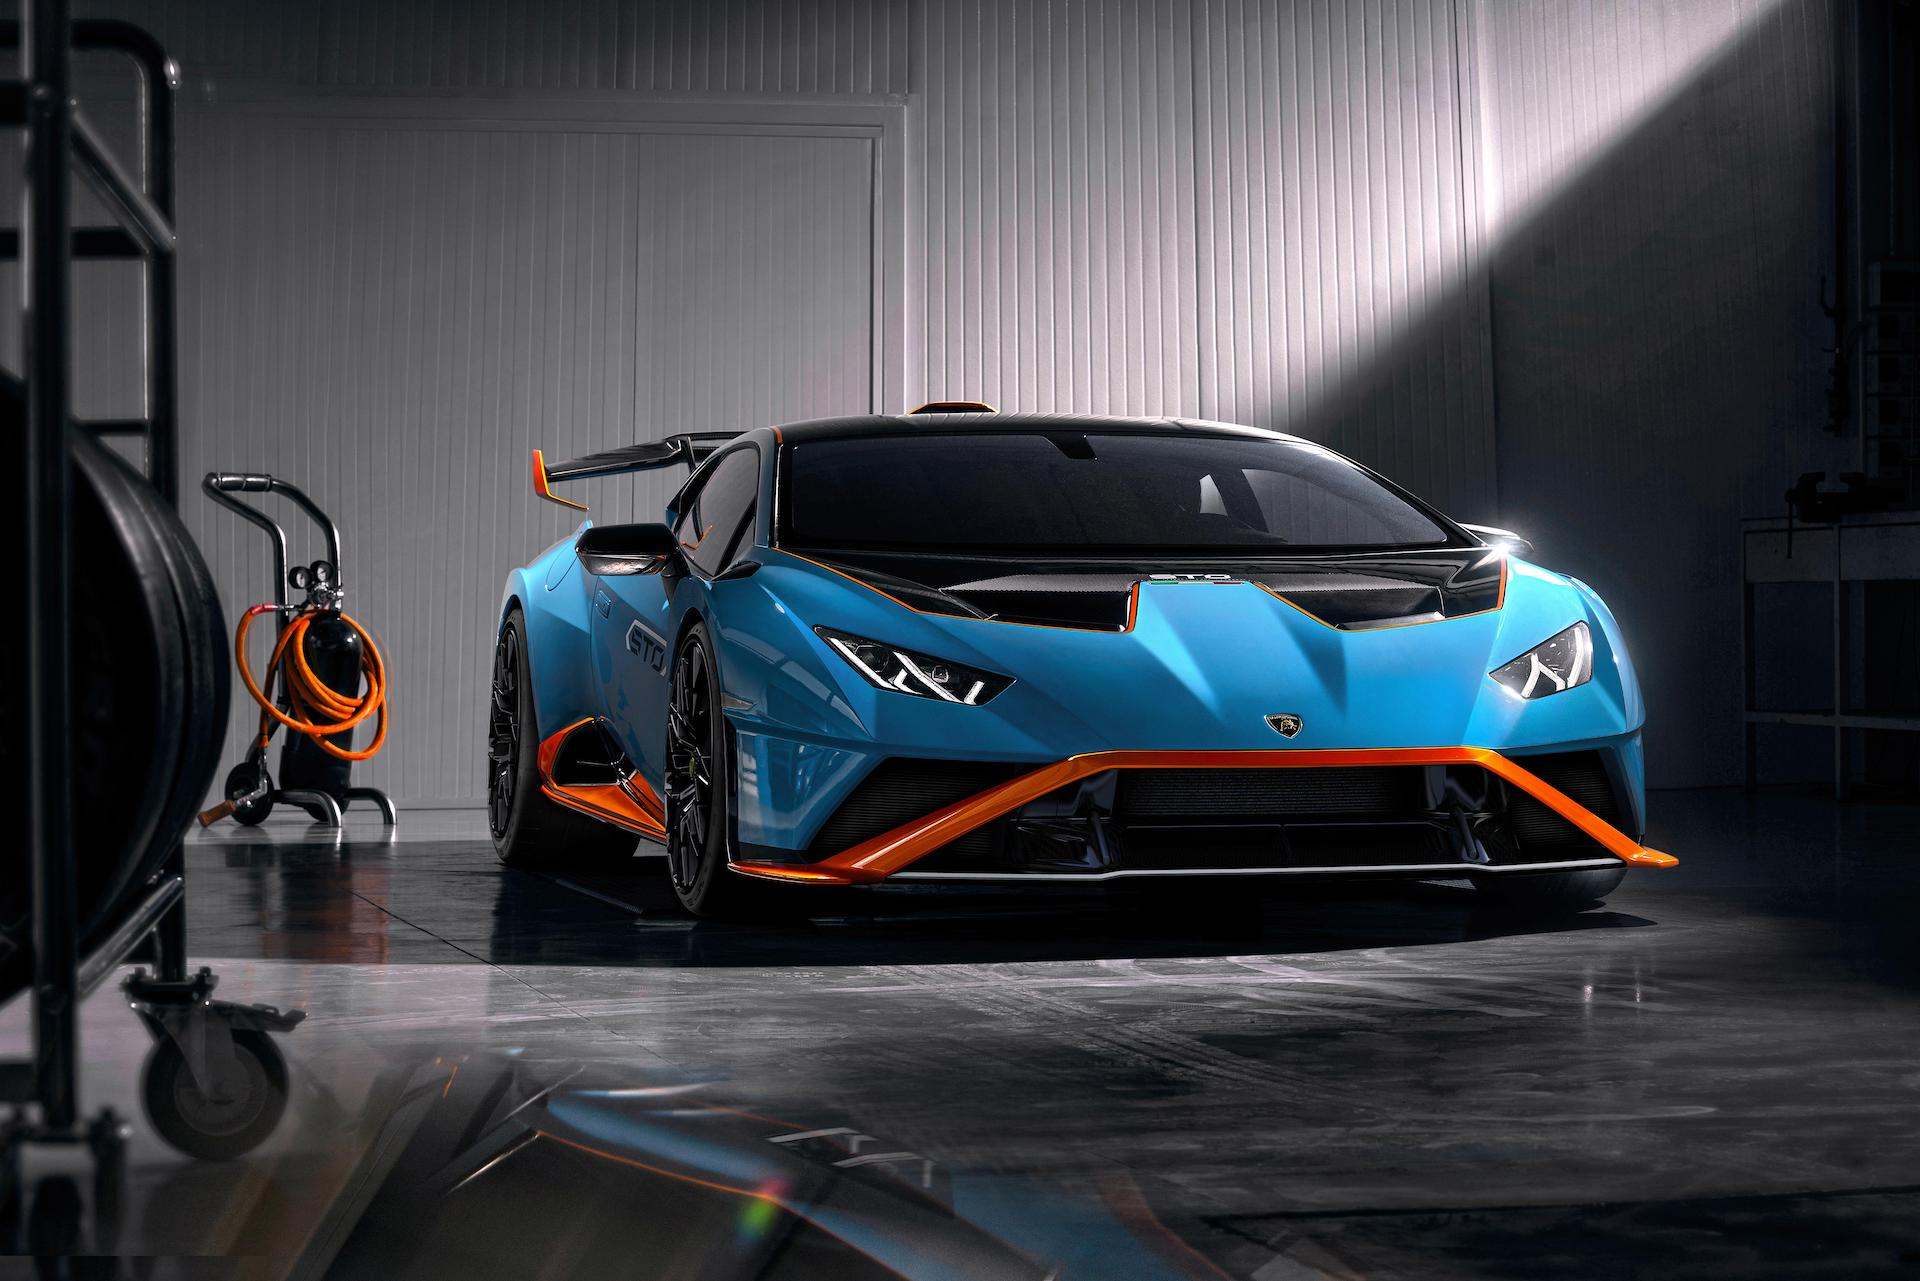 Der neue Lamborghini STO: Die Inkarnation des Squadra Corse-Erbes 3